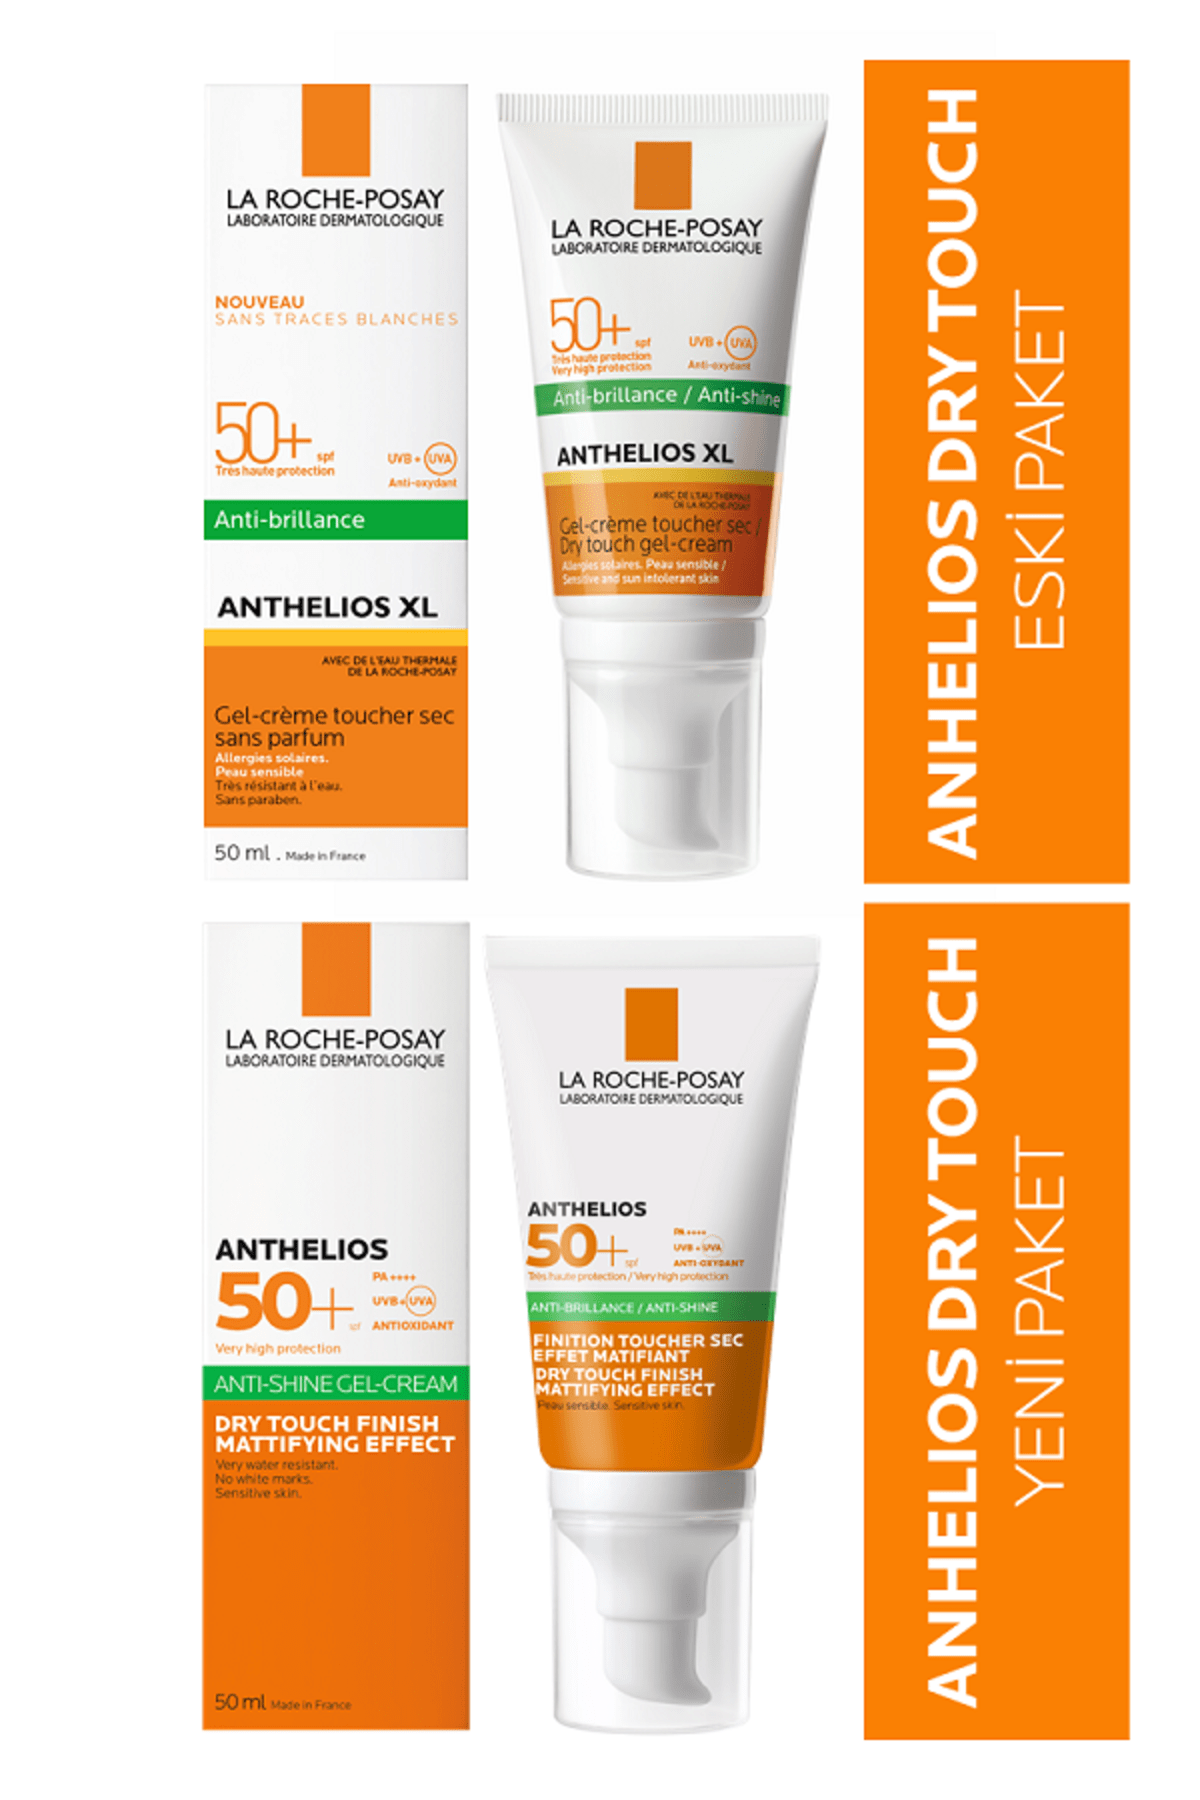 La Roche Posay Anthelios Xl Spf 50+ Dry Touch Gel-Cream Anti-Shine 50 ml 4